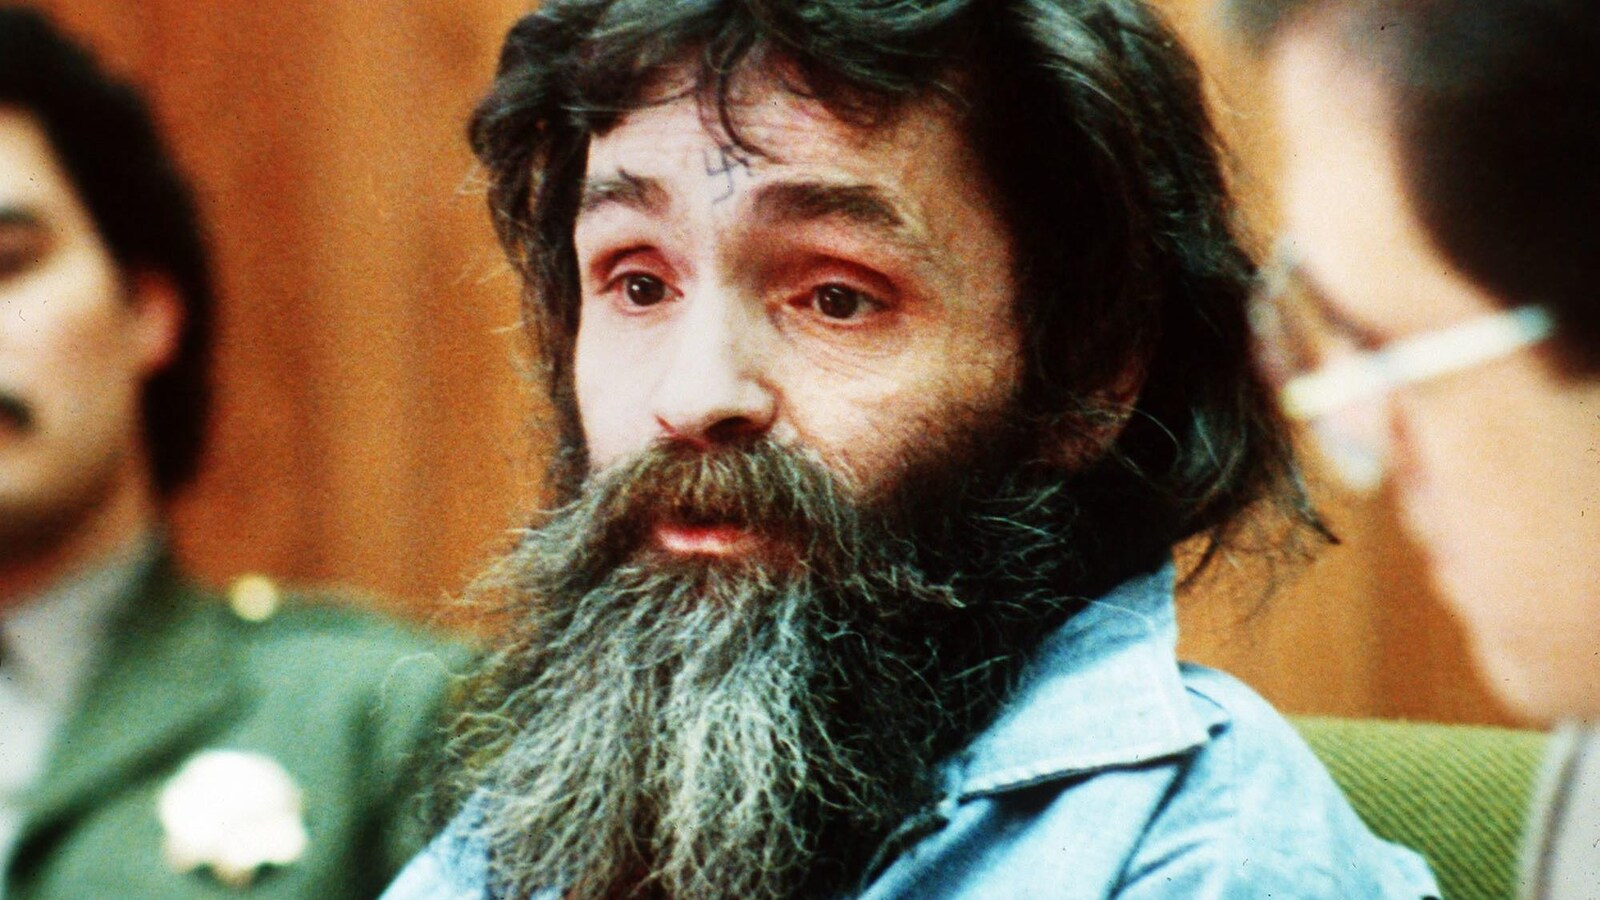 Charles Manson en 1986